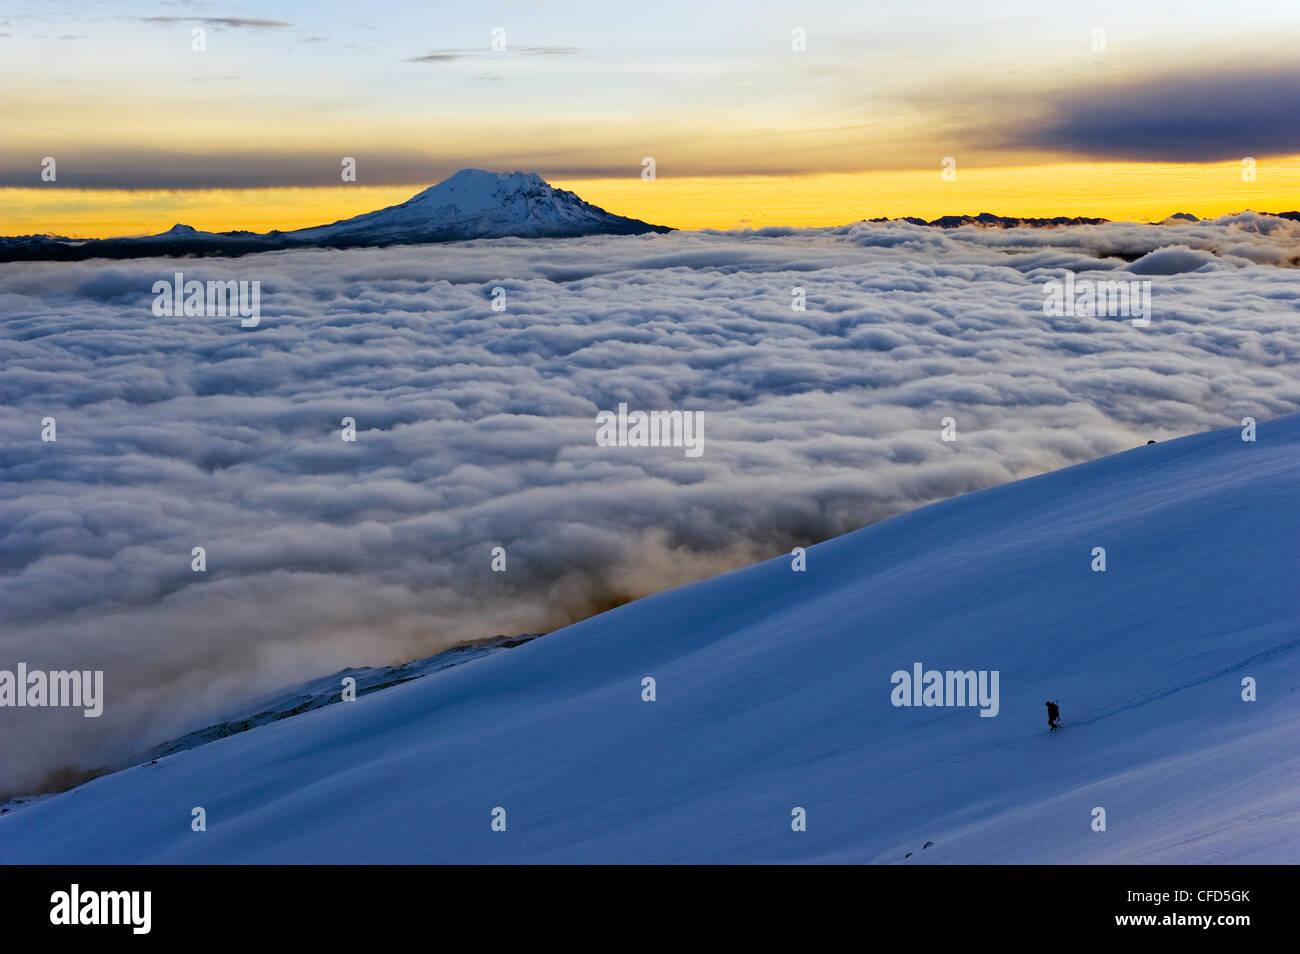 Blick vom Vulkan Cotopaxi, 5897m, der höchste aktive Vulkan der Welt, Ecuador, Südamerika Stockbild